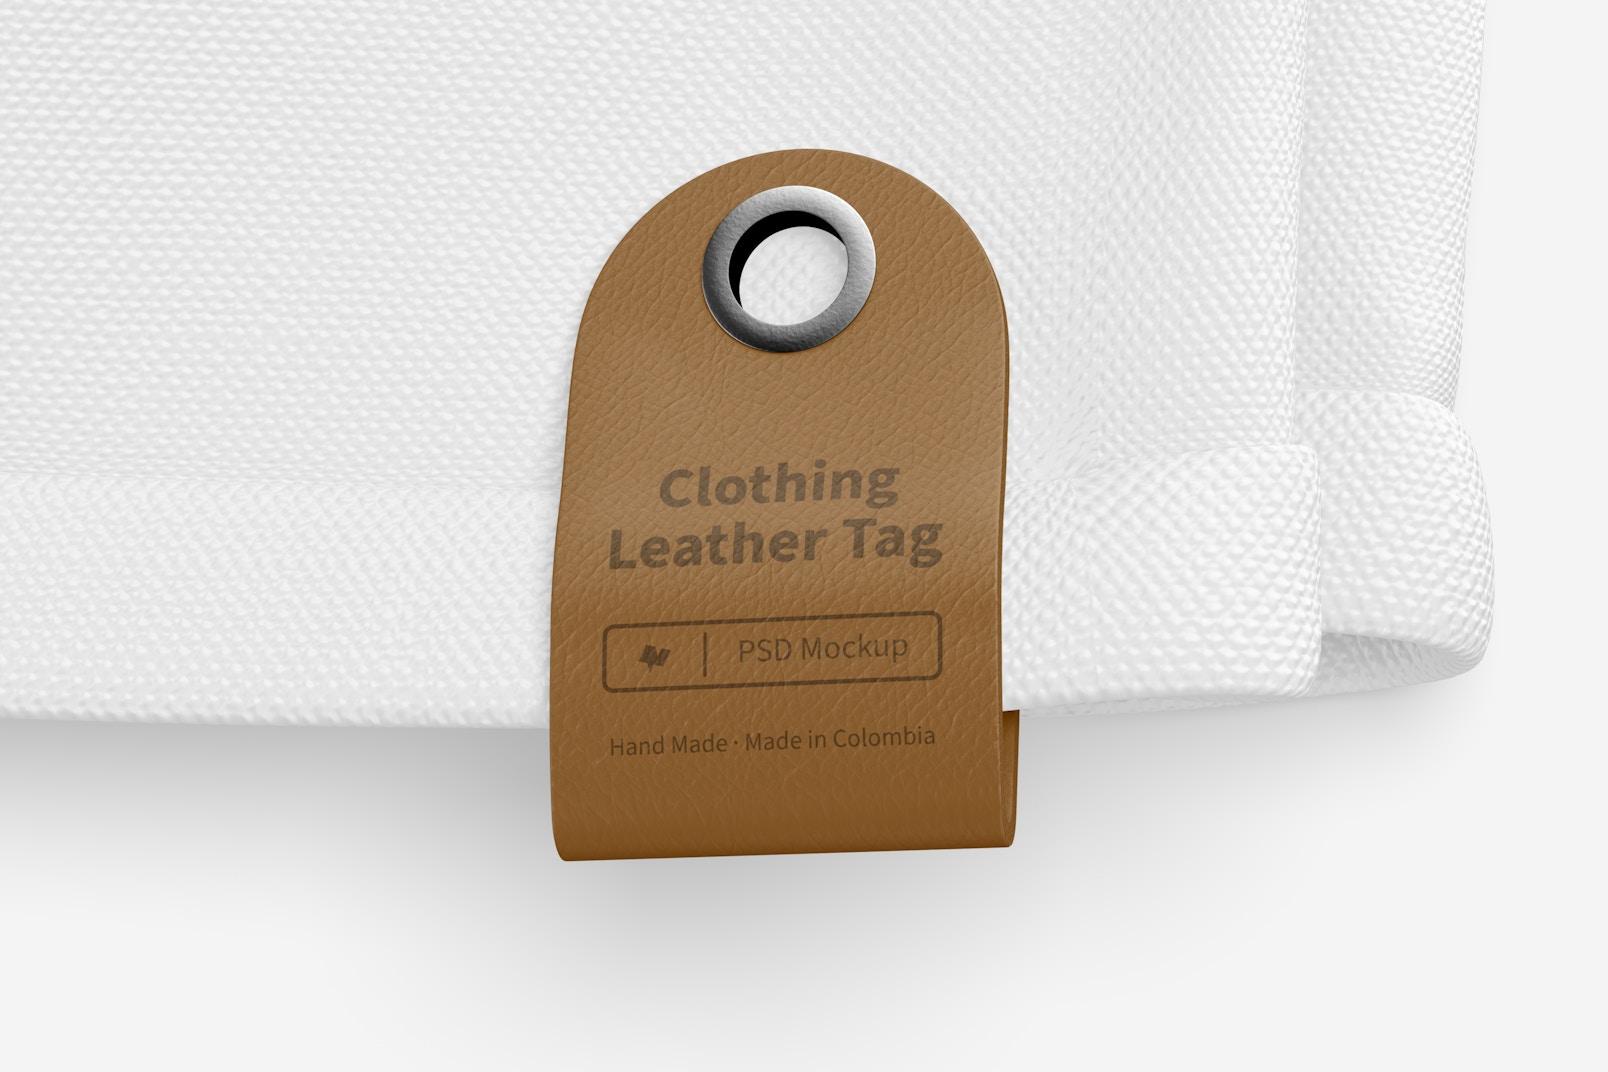 Clothing Leather Tag Mockup 02